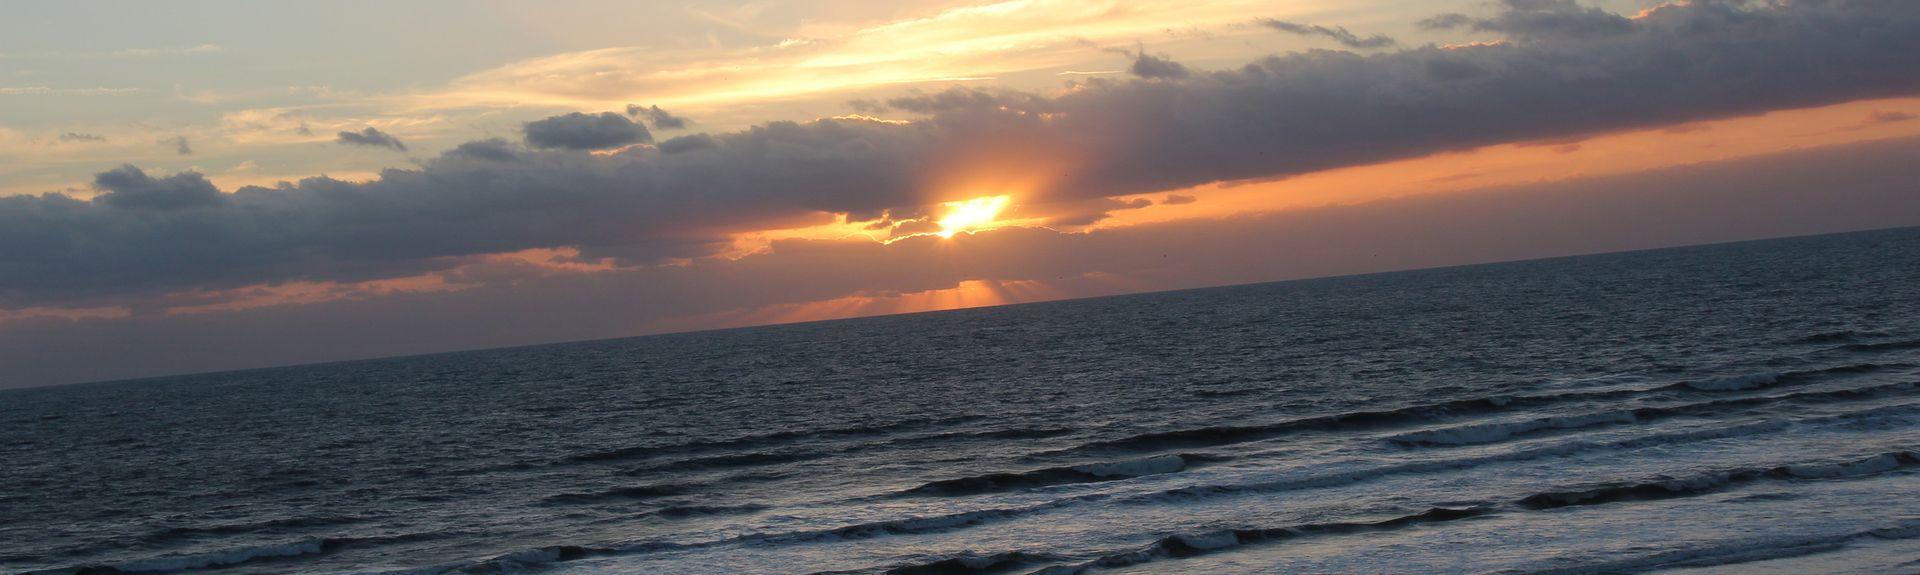 Sandcastles (Cocoa Beach, Florida, Verenigde Staten)